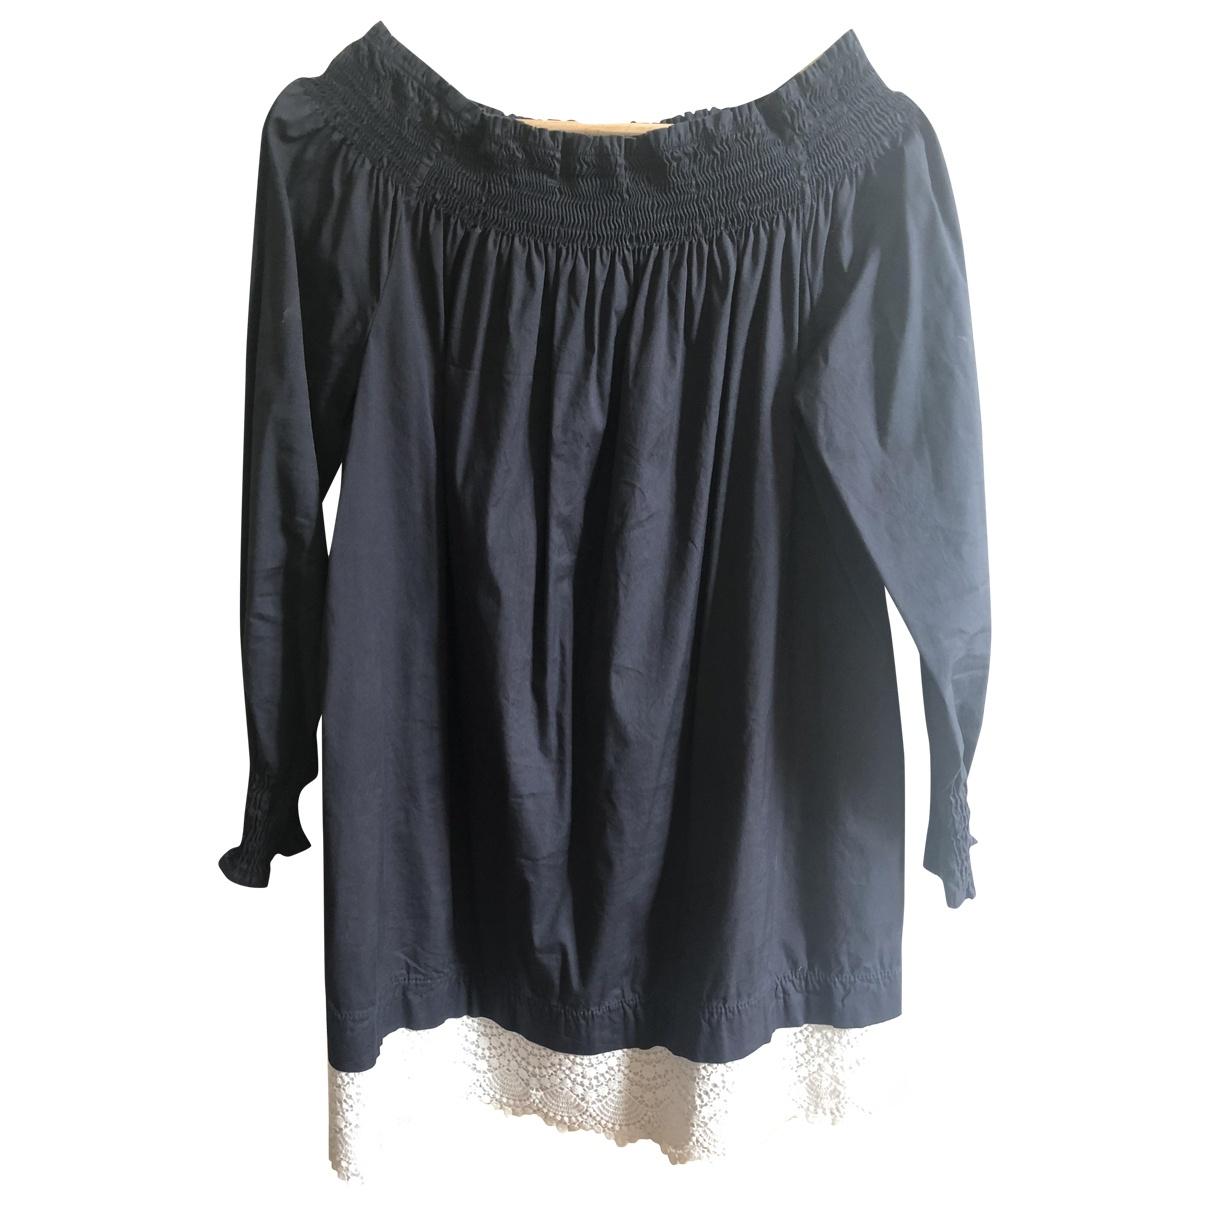 Zara \N Navy dress for Women M International